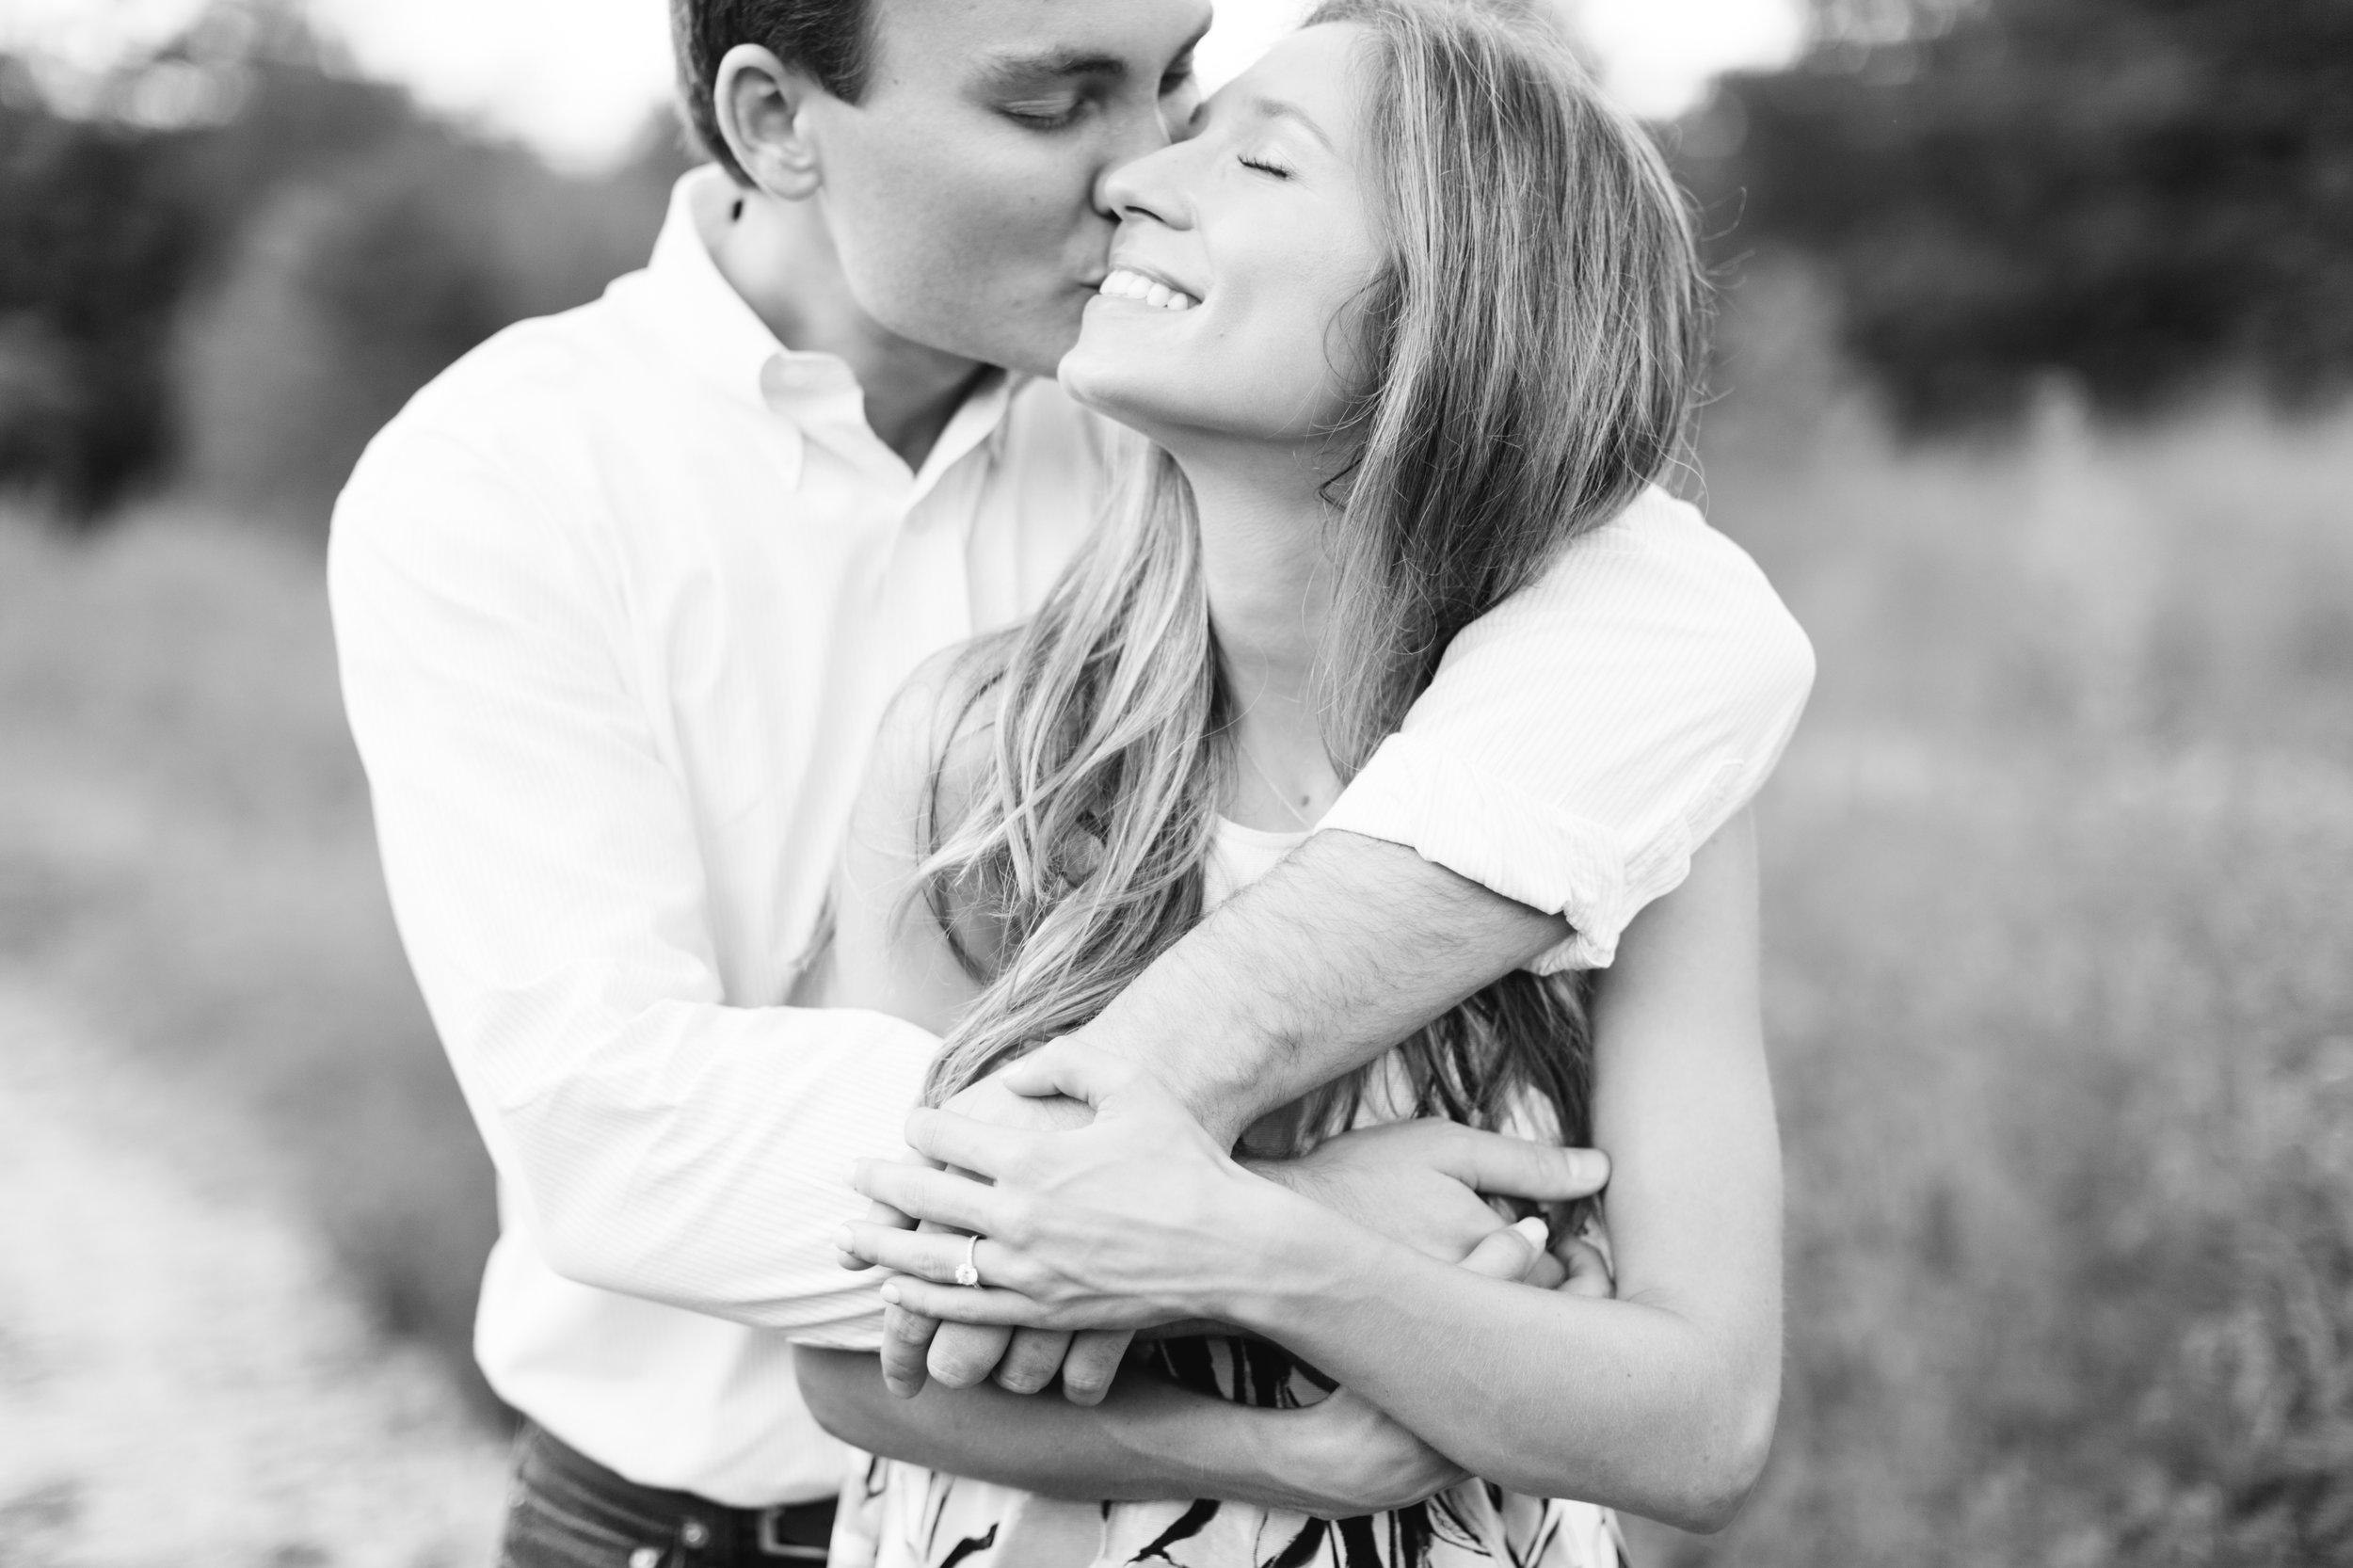 Olivia_Patrick_Engagement_Abigail_Malone_Photography-135.jpg